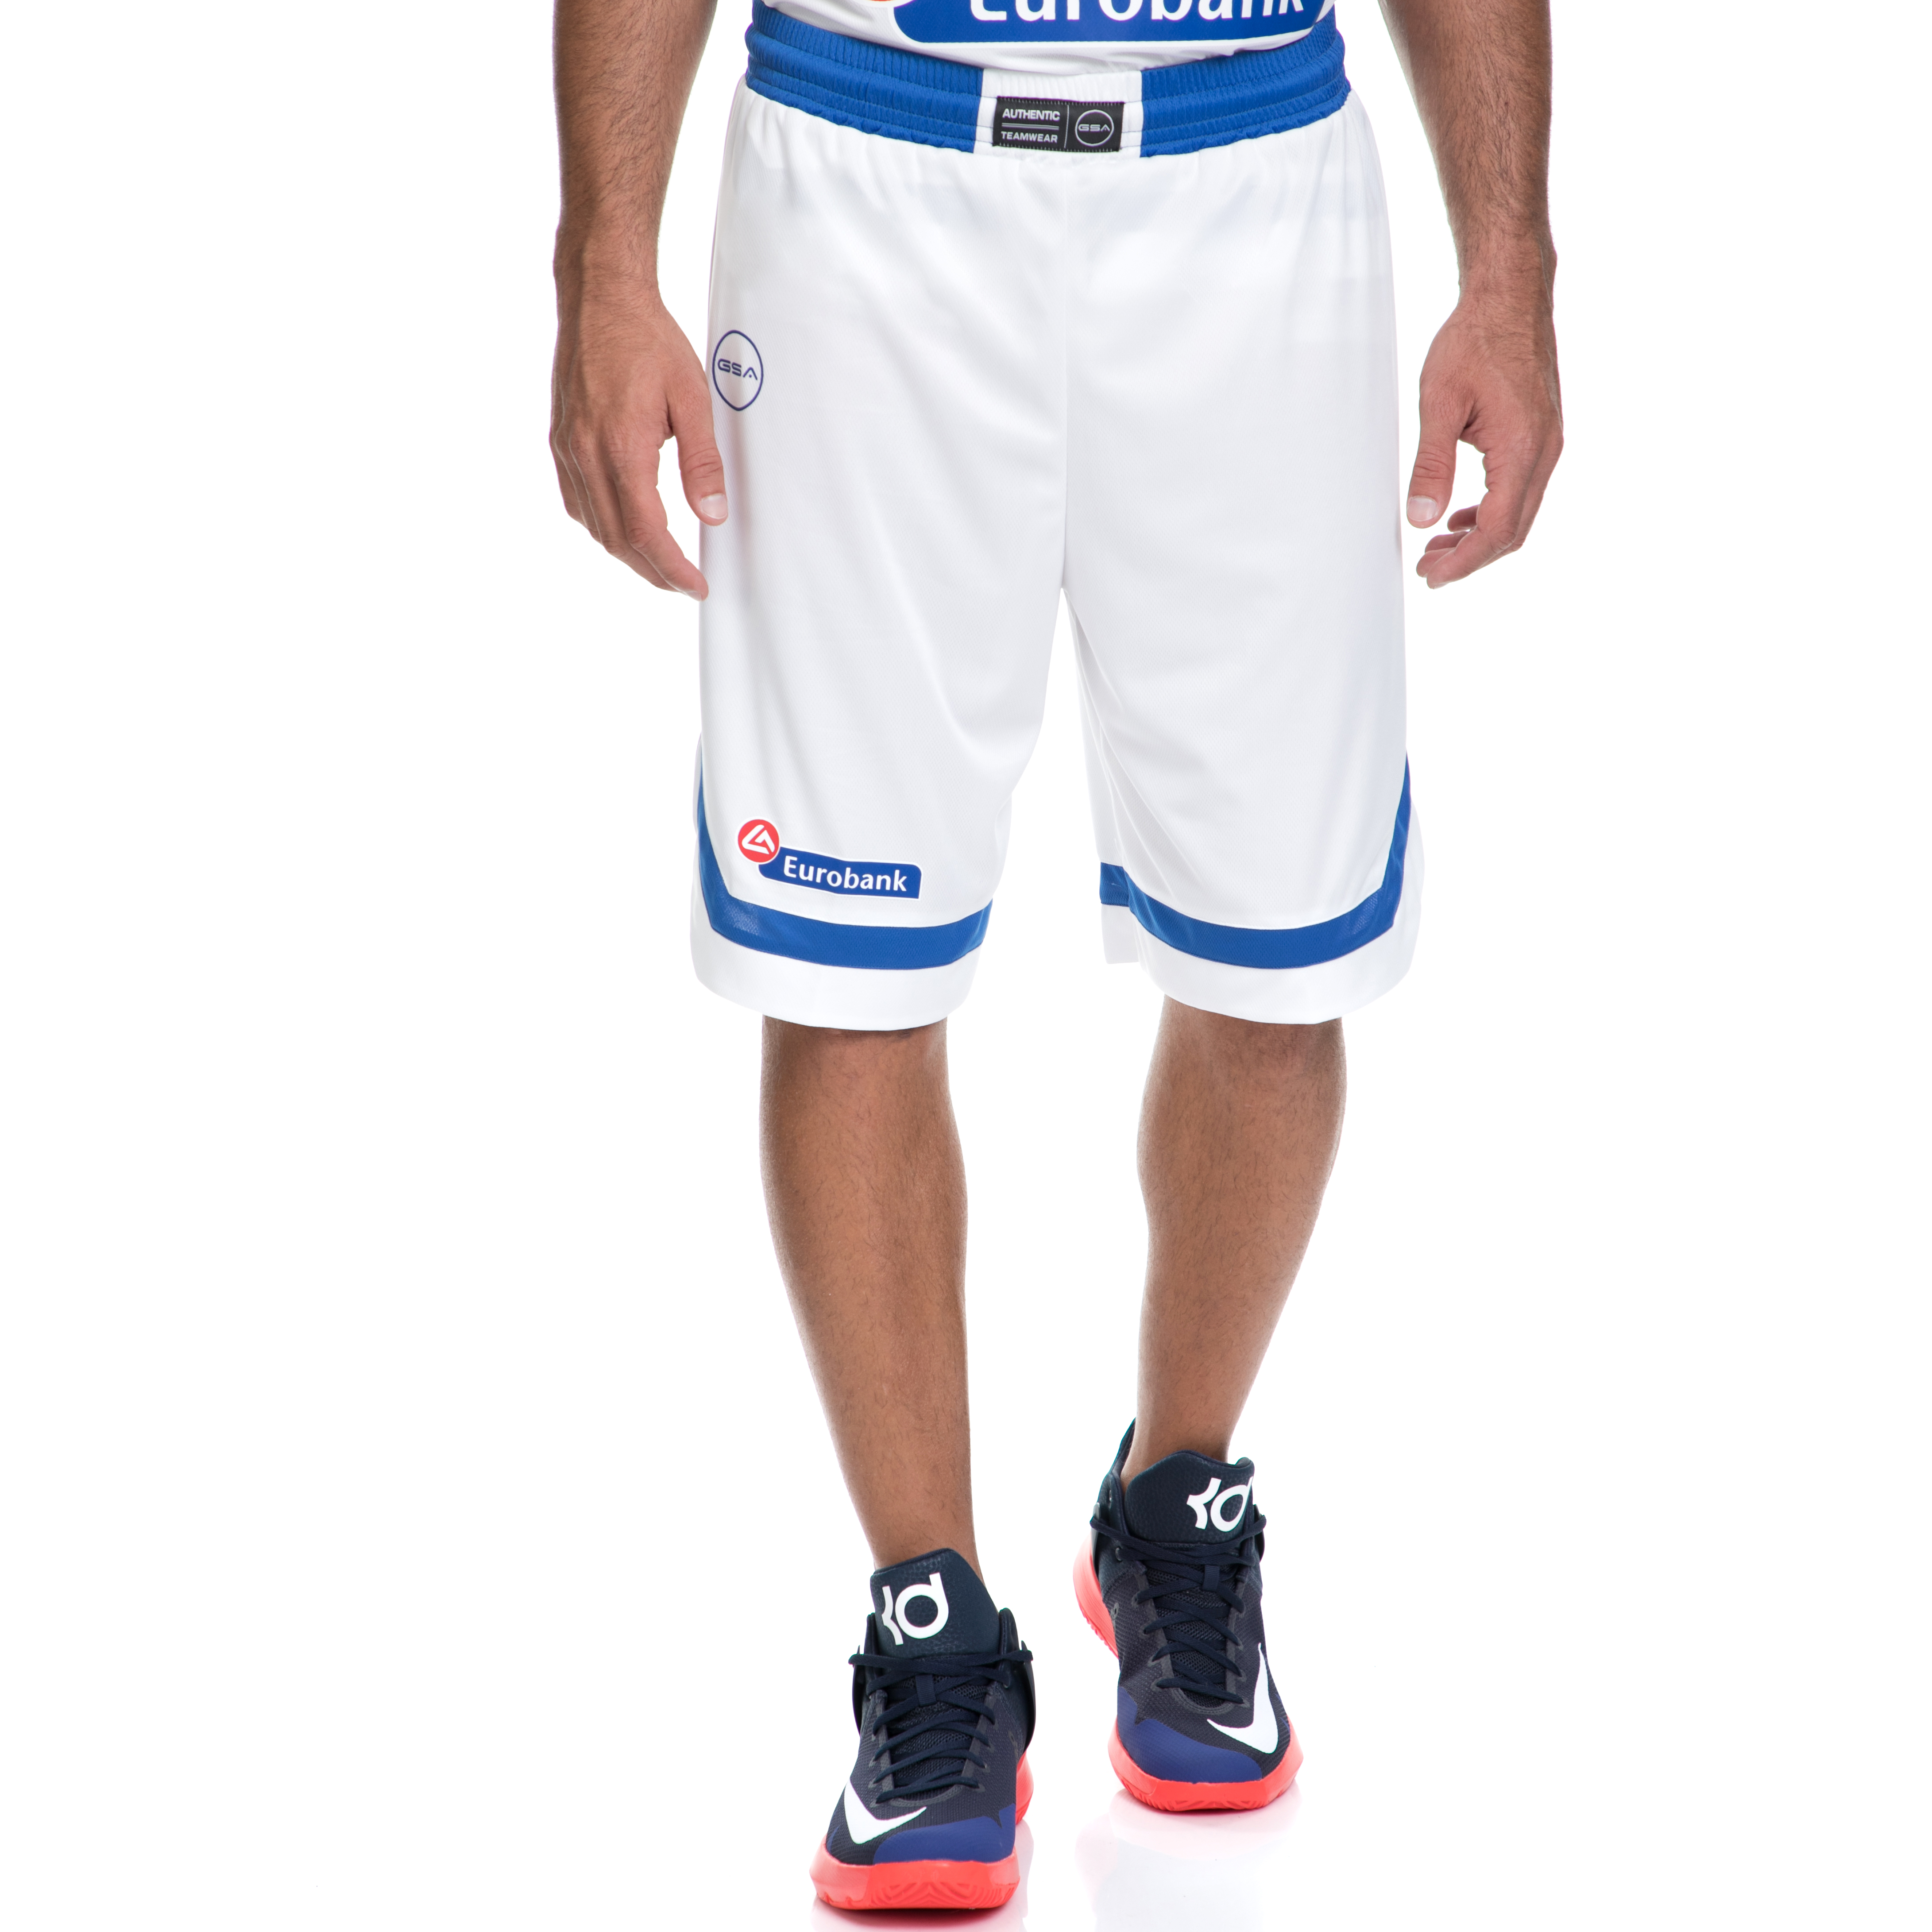 GSA - Ανδρική βερμούδα της Εθνικής Ελλάδος Basket GSA λευκή